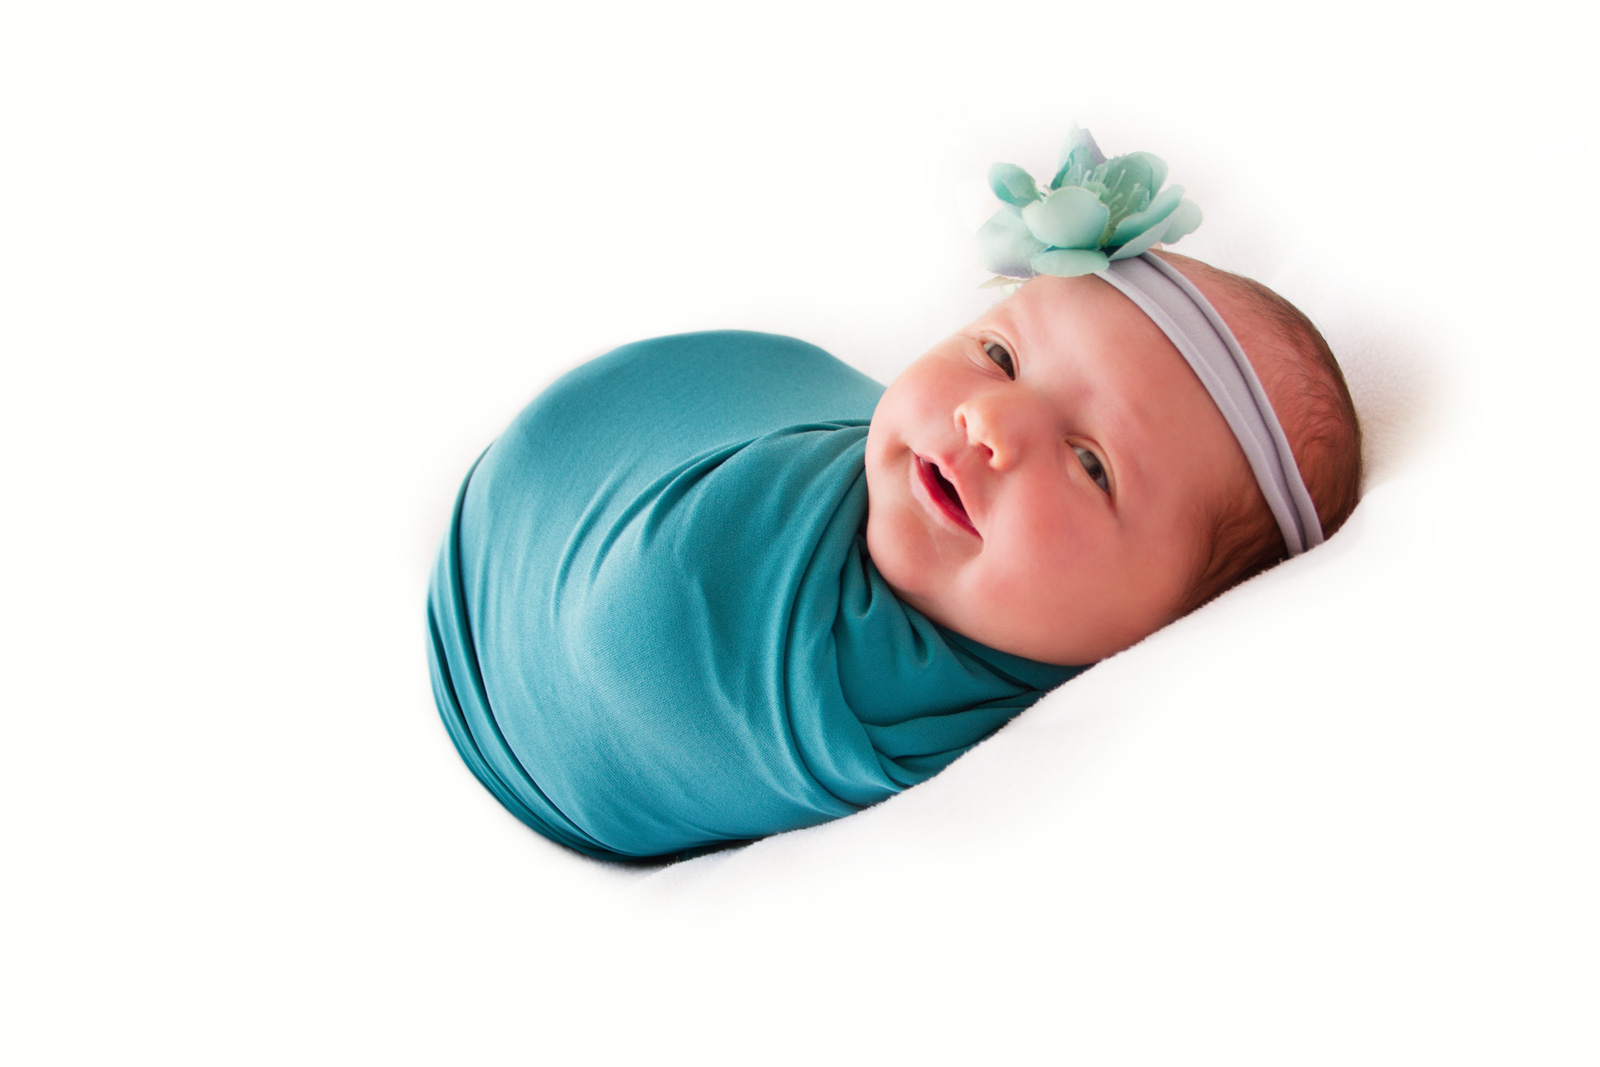 newborn-photographer-in-cape-town, cape-town-newborn-photographer, maternity-session-in-cape-town, maternity-photographer-in-cape-town, cape-town-maternity-photographer